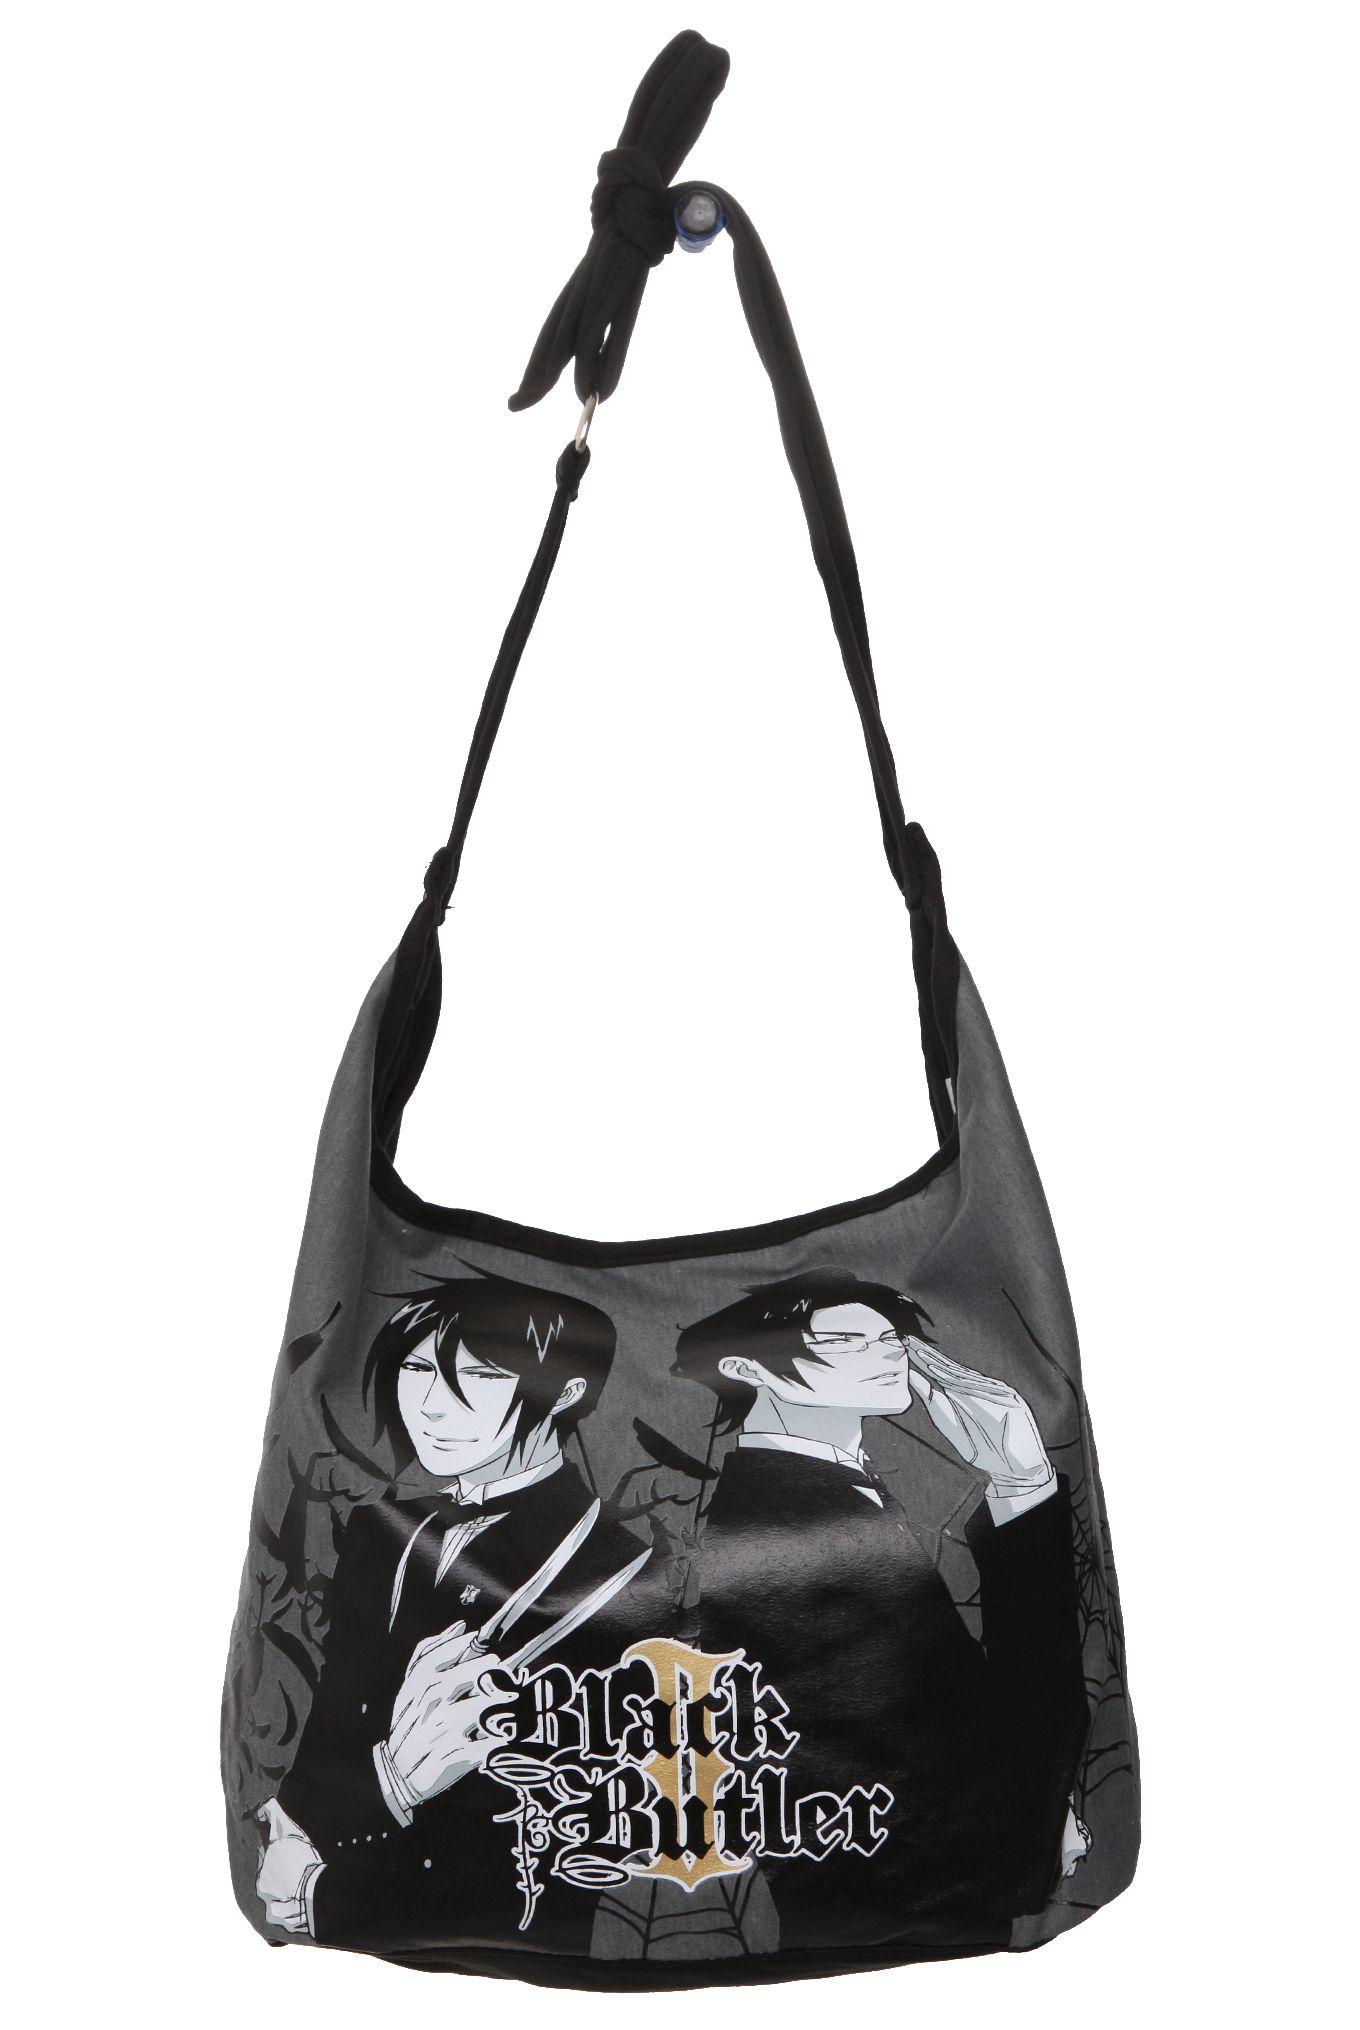 Black Butler Hobo Bag Hot Topic